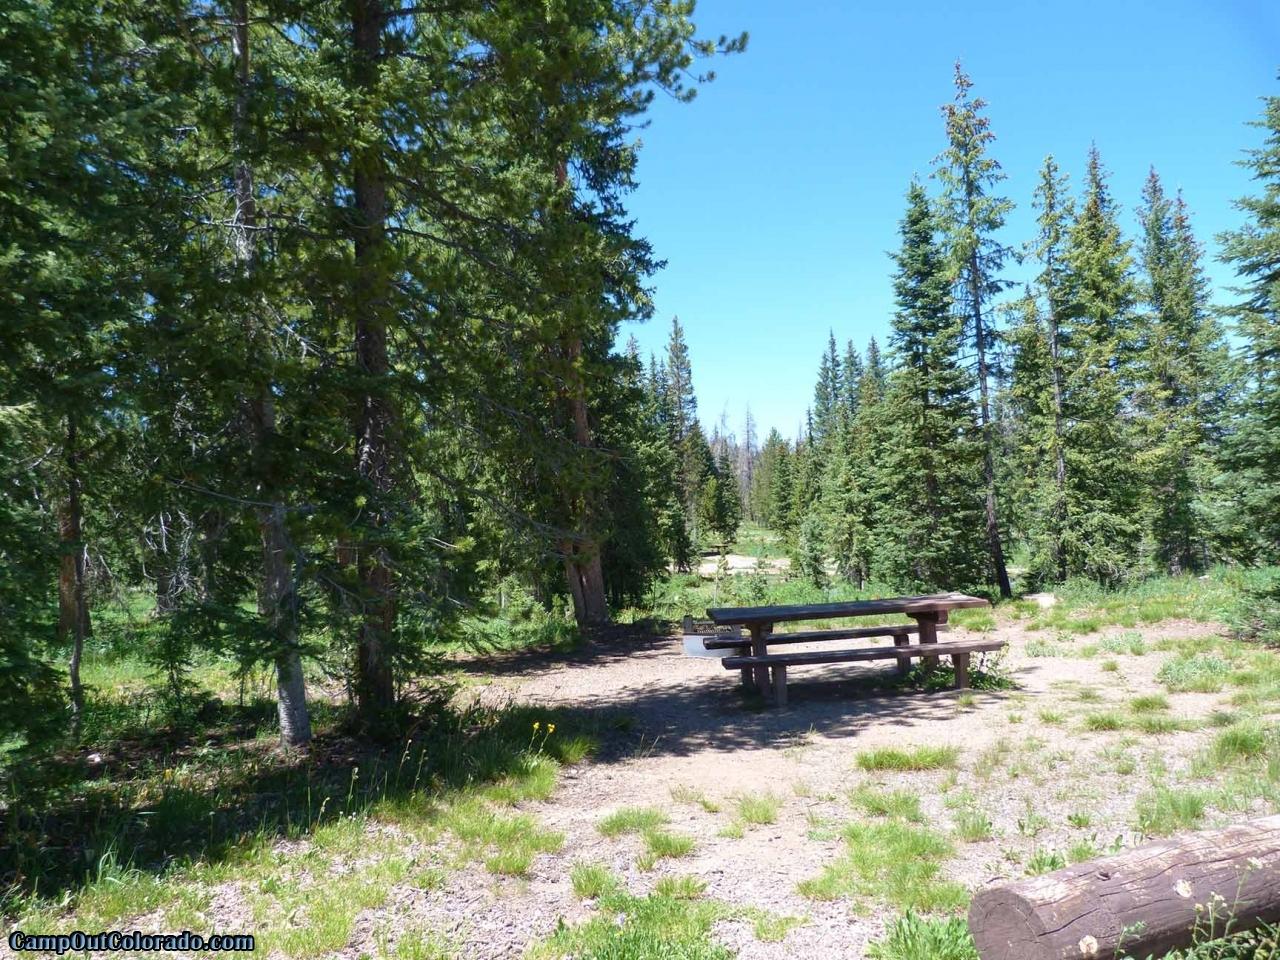 campoutcolorado-meadows-campground-rabbit-ears-trees